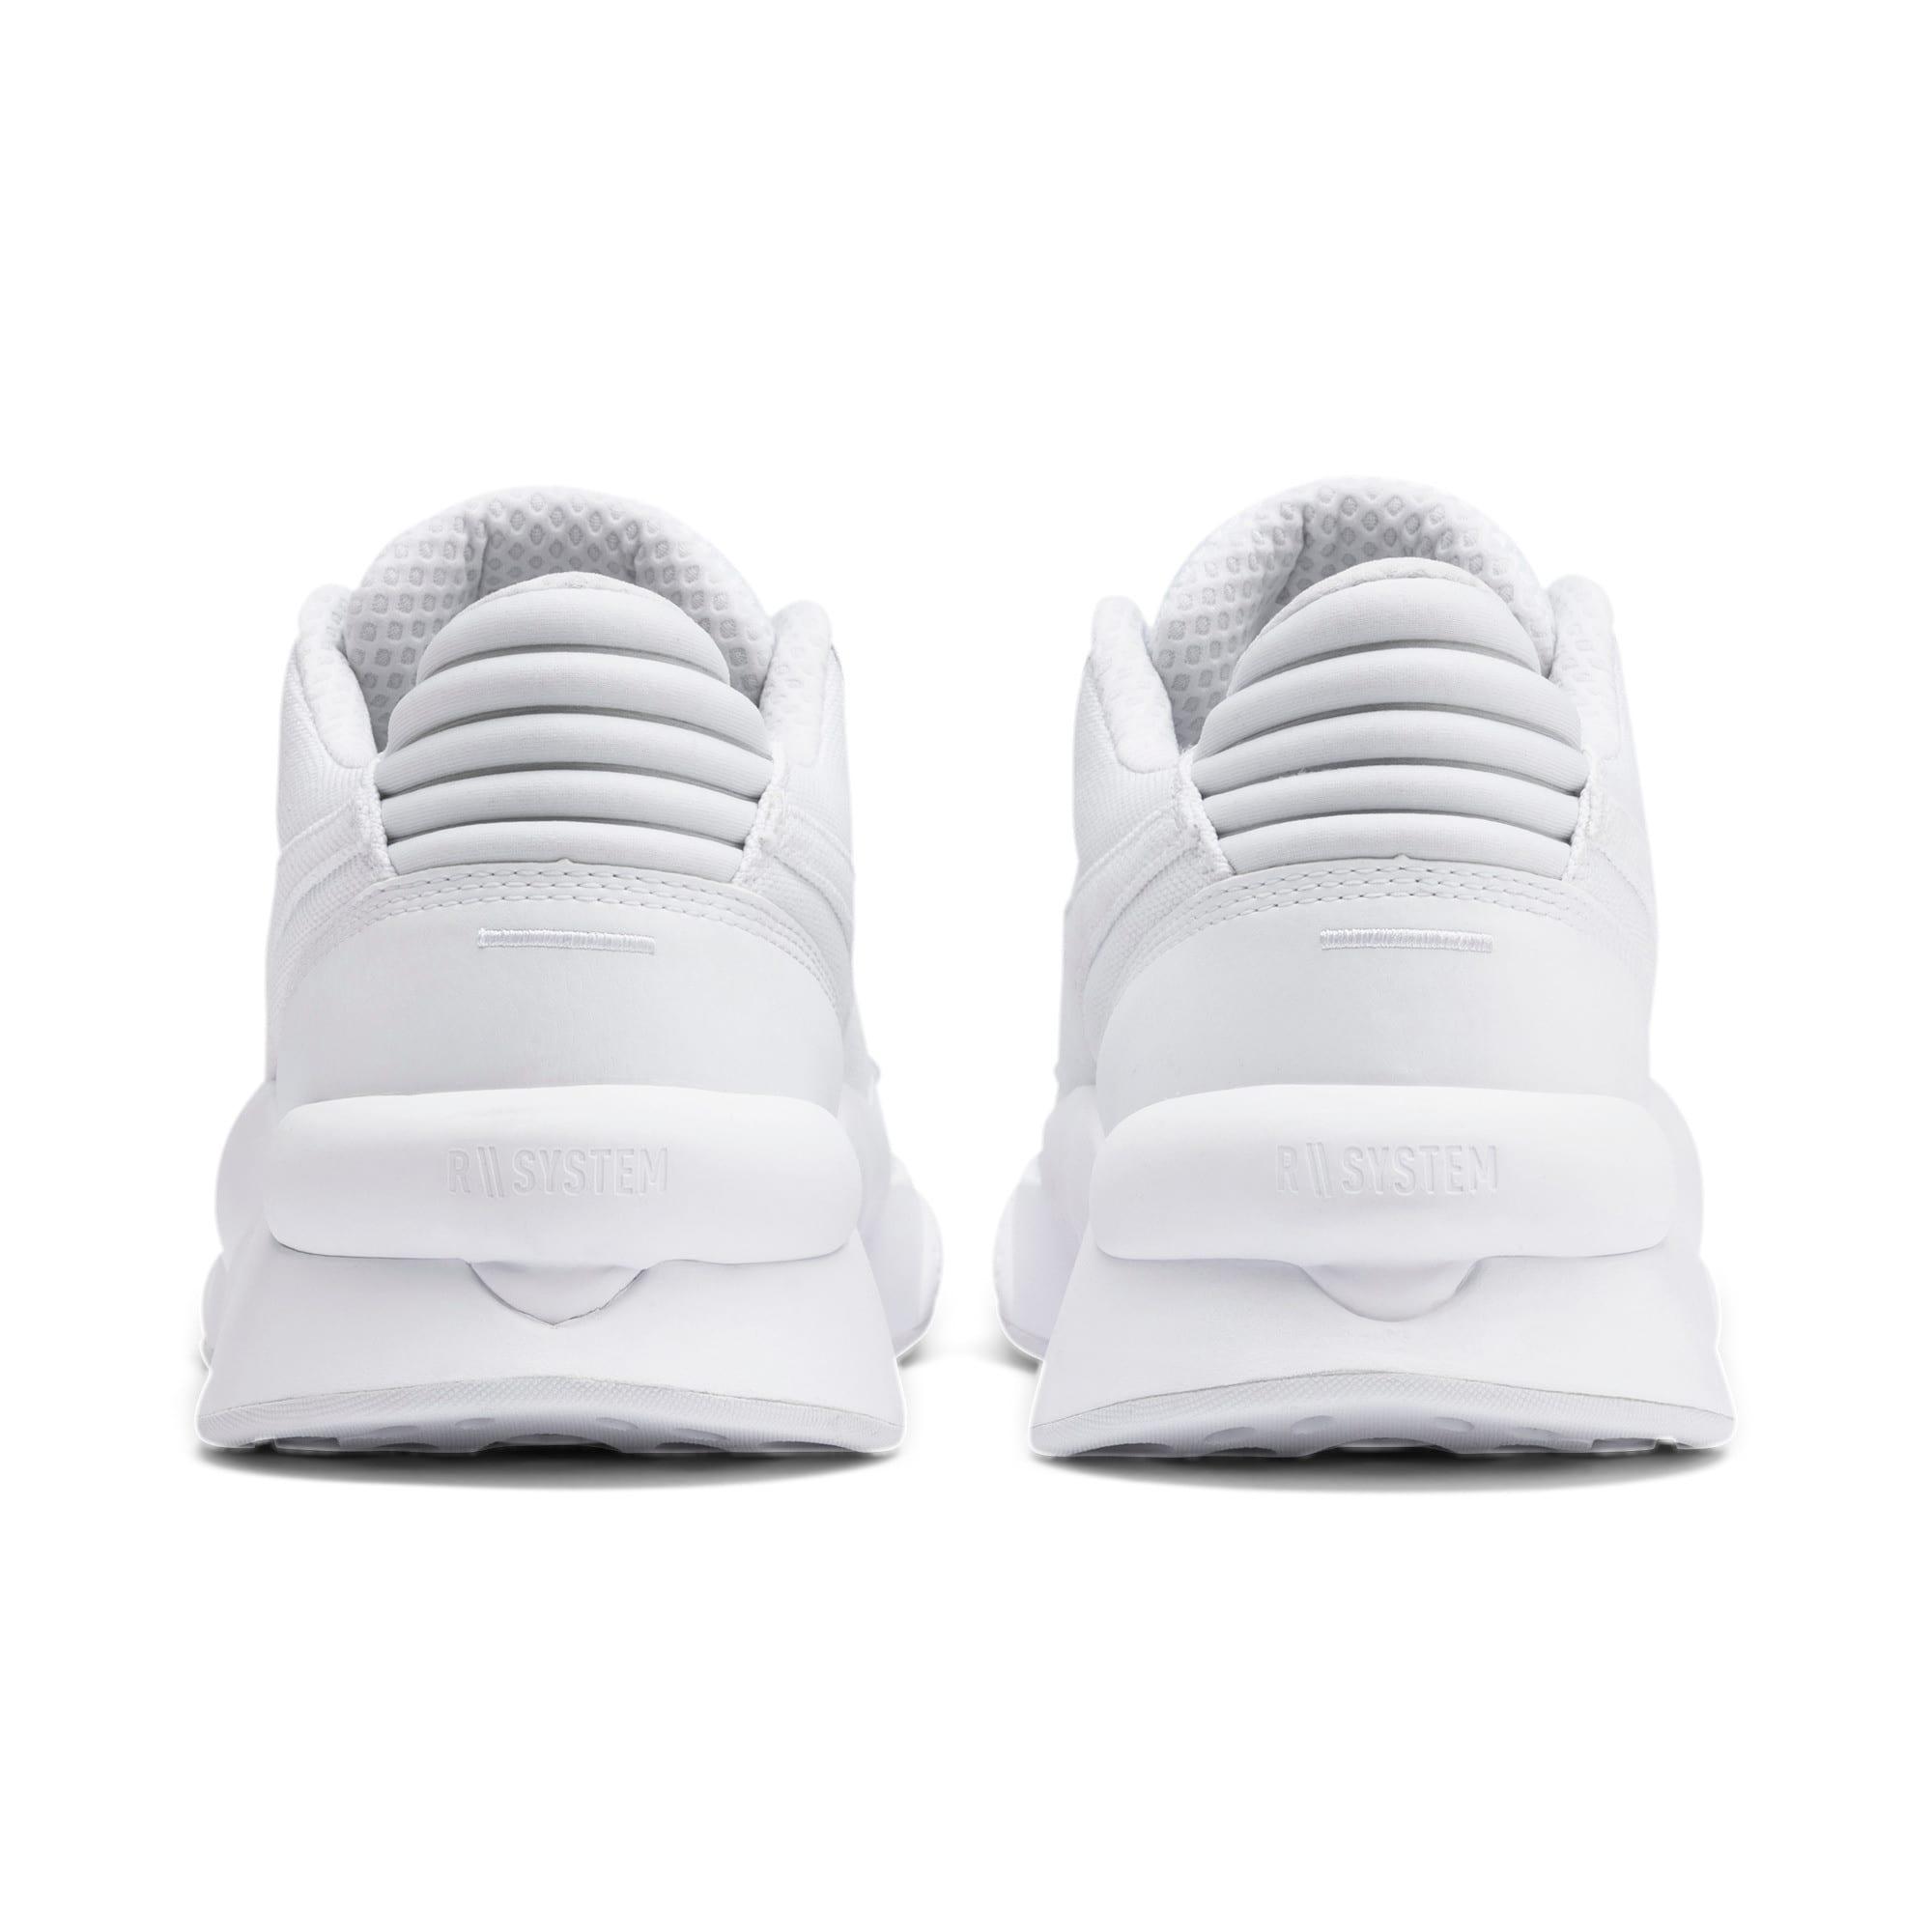 Thumbnail 3 of RS 9.8 Sneaker, Puma White, medium